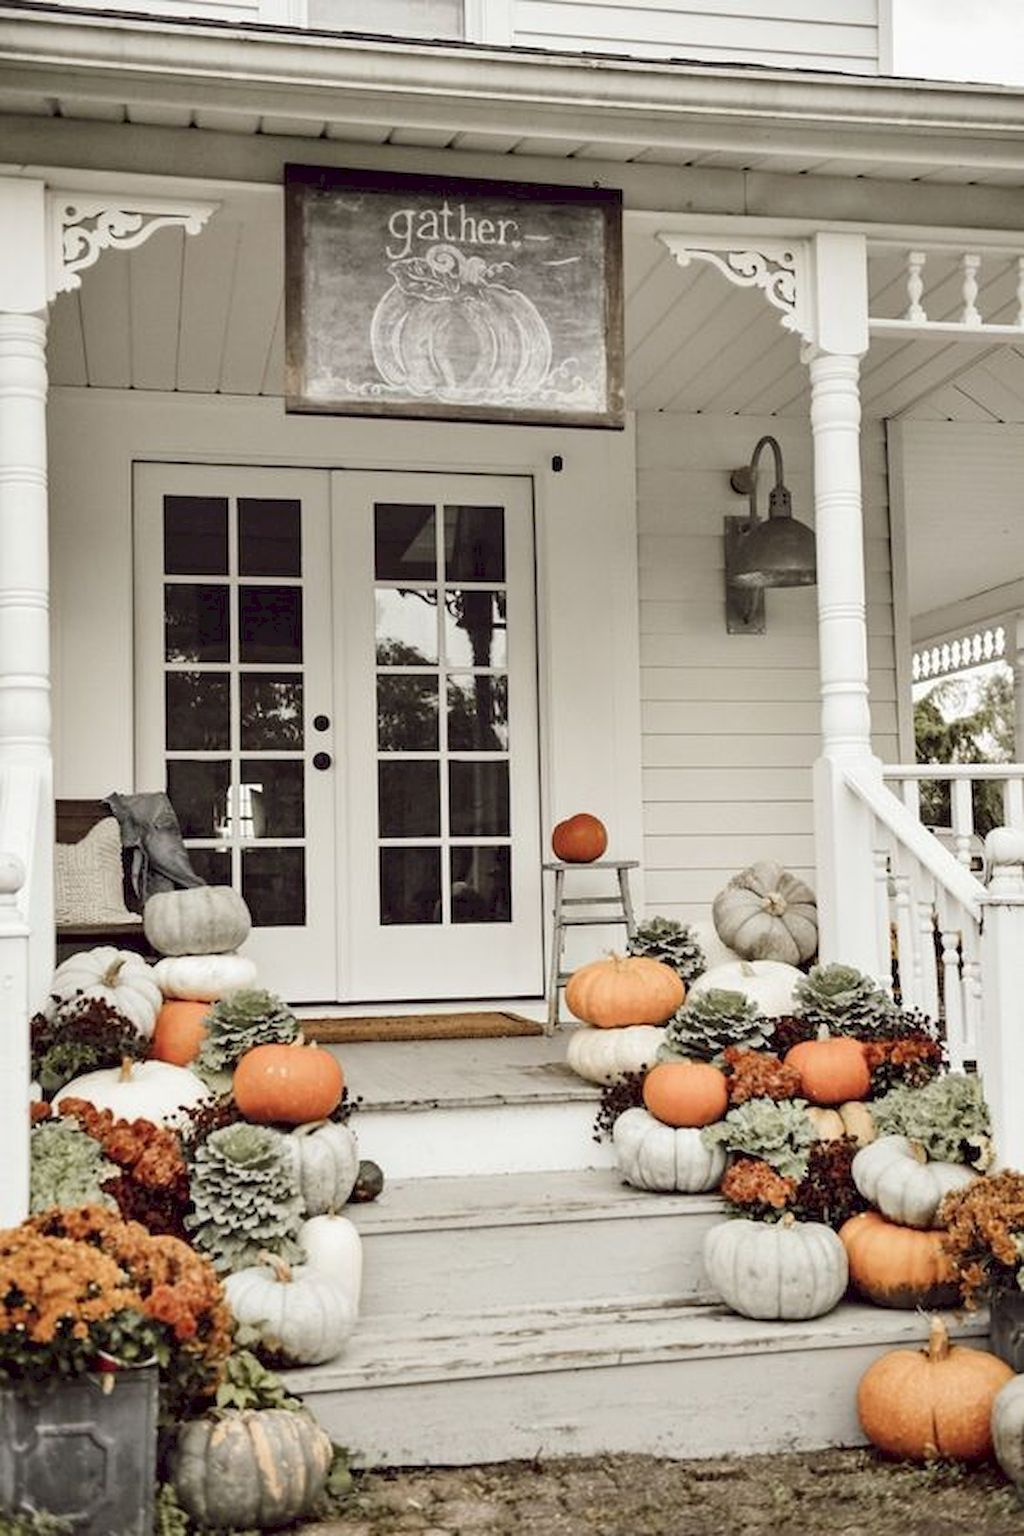 60 neutral fall porch ideas with pumpkins and cornstalks